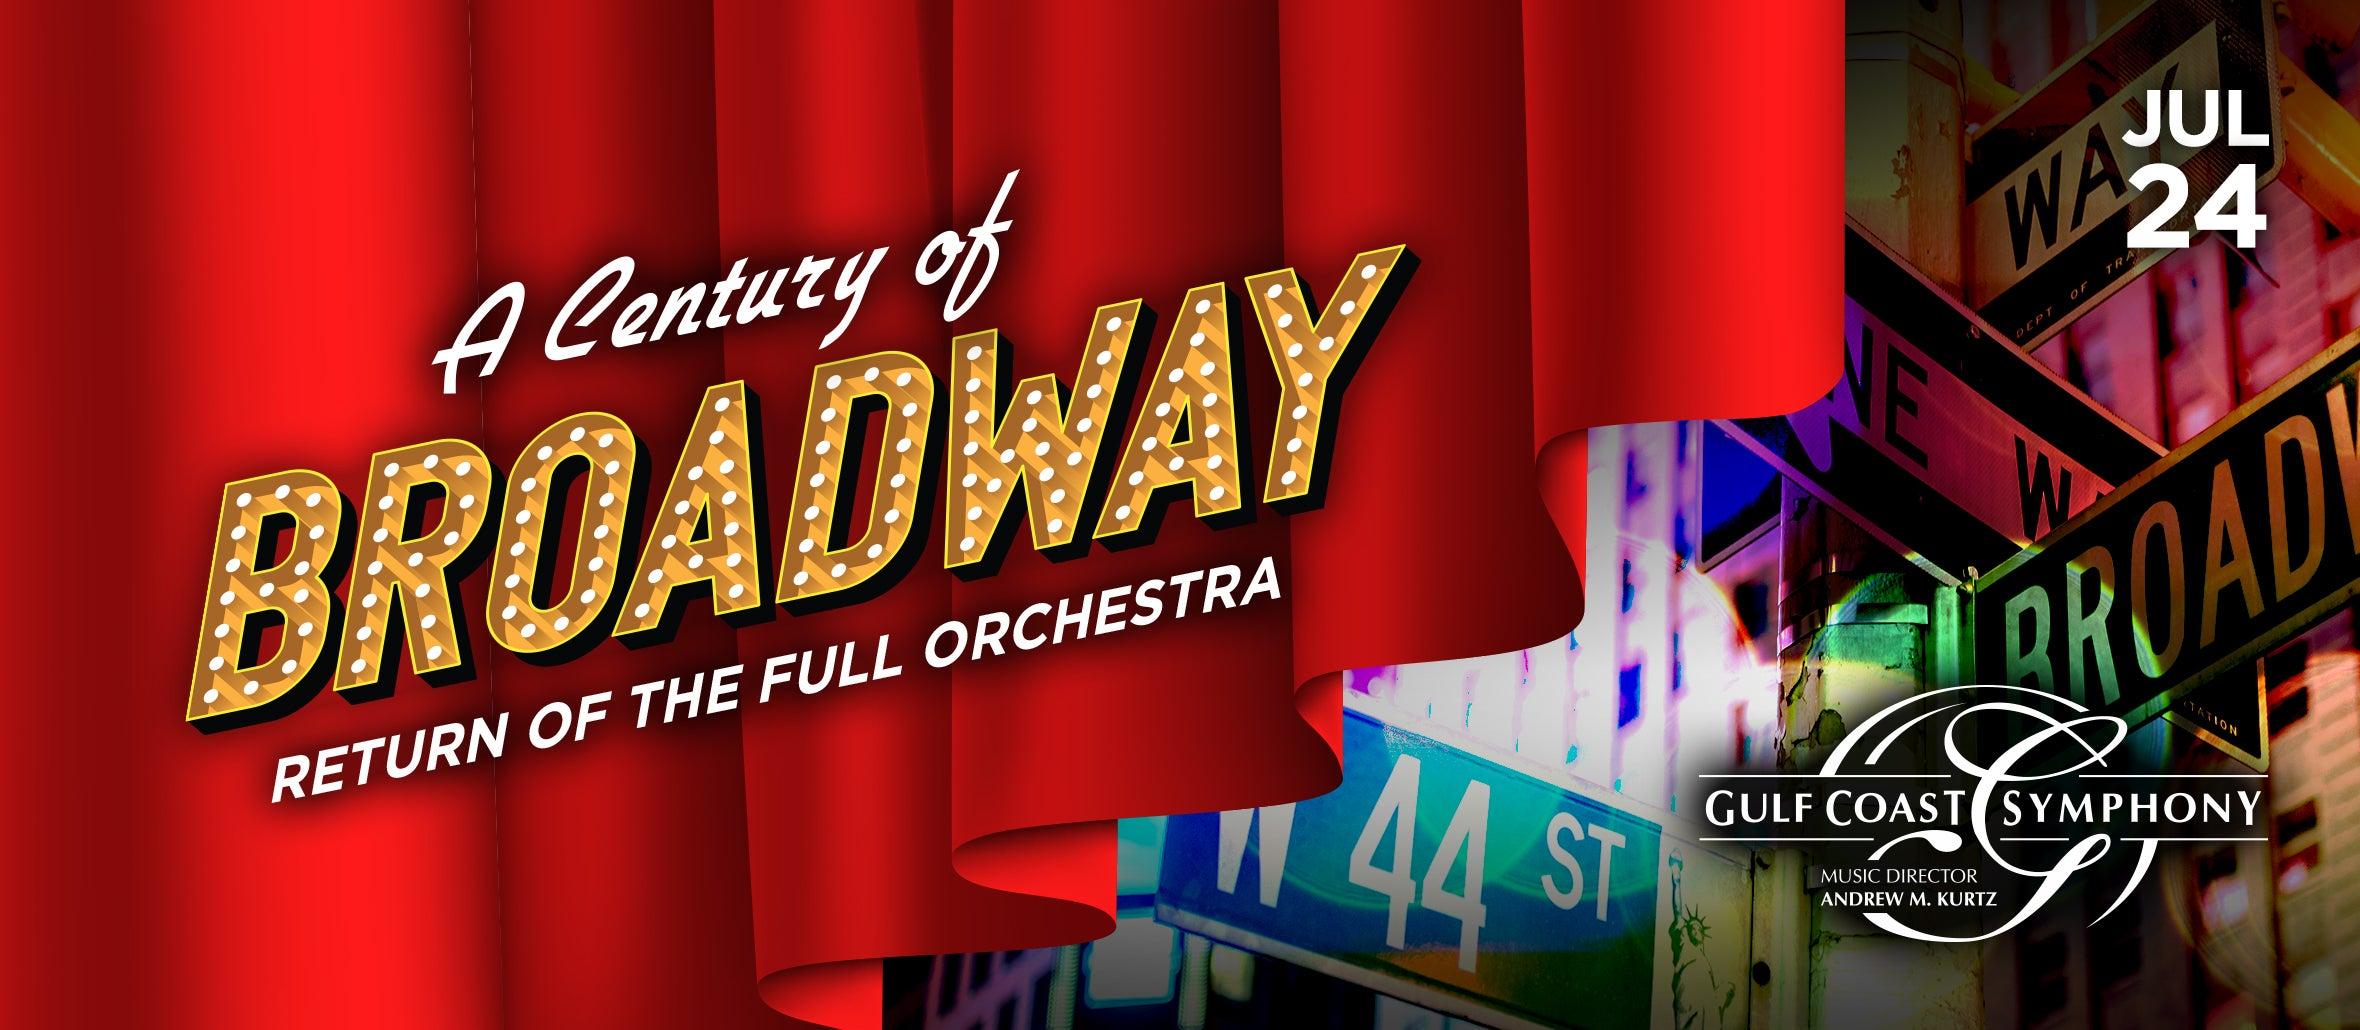 Gulf Coast Symphony: A Century of Broadway